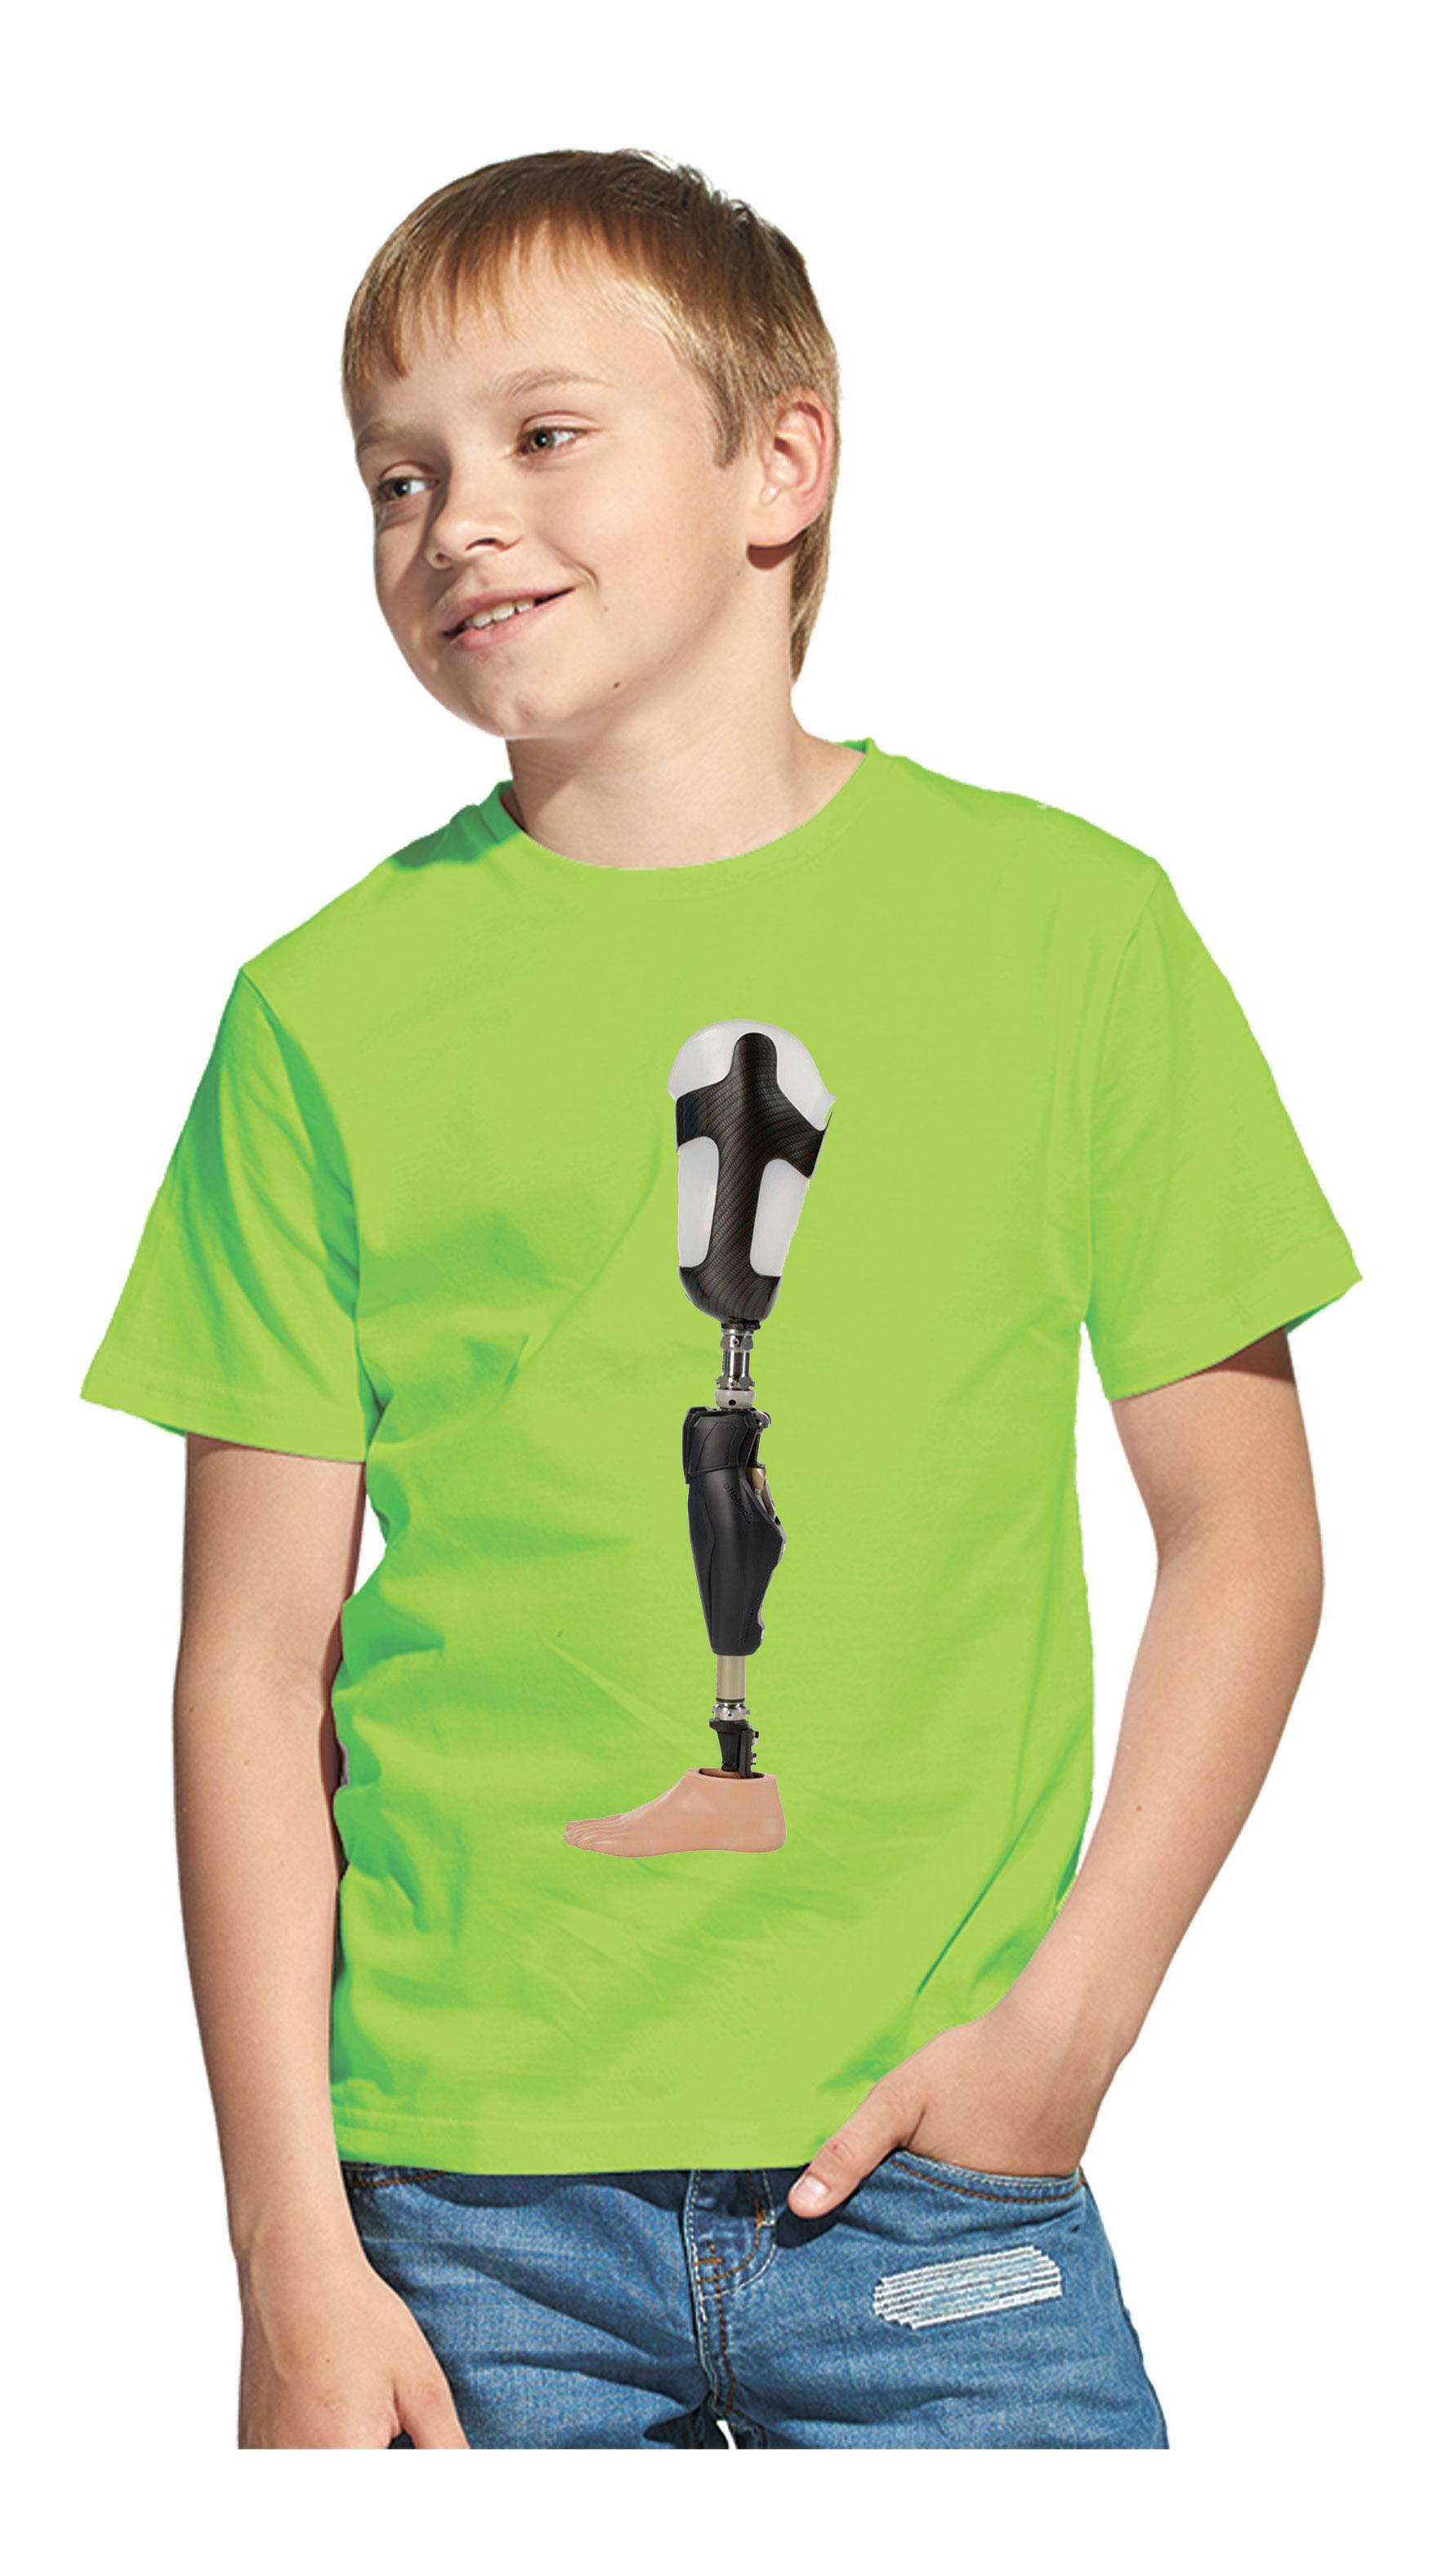 Нарисовать принты на футболки для компании Моторика фото f_47360a5f25d56f43.jpg